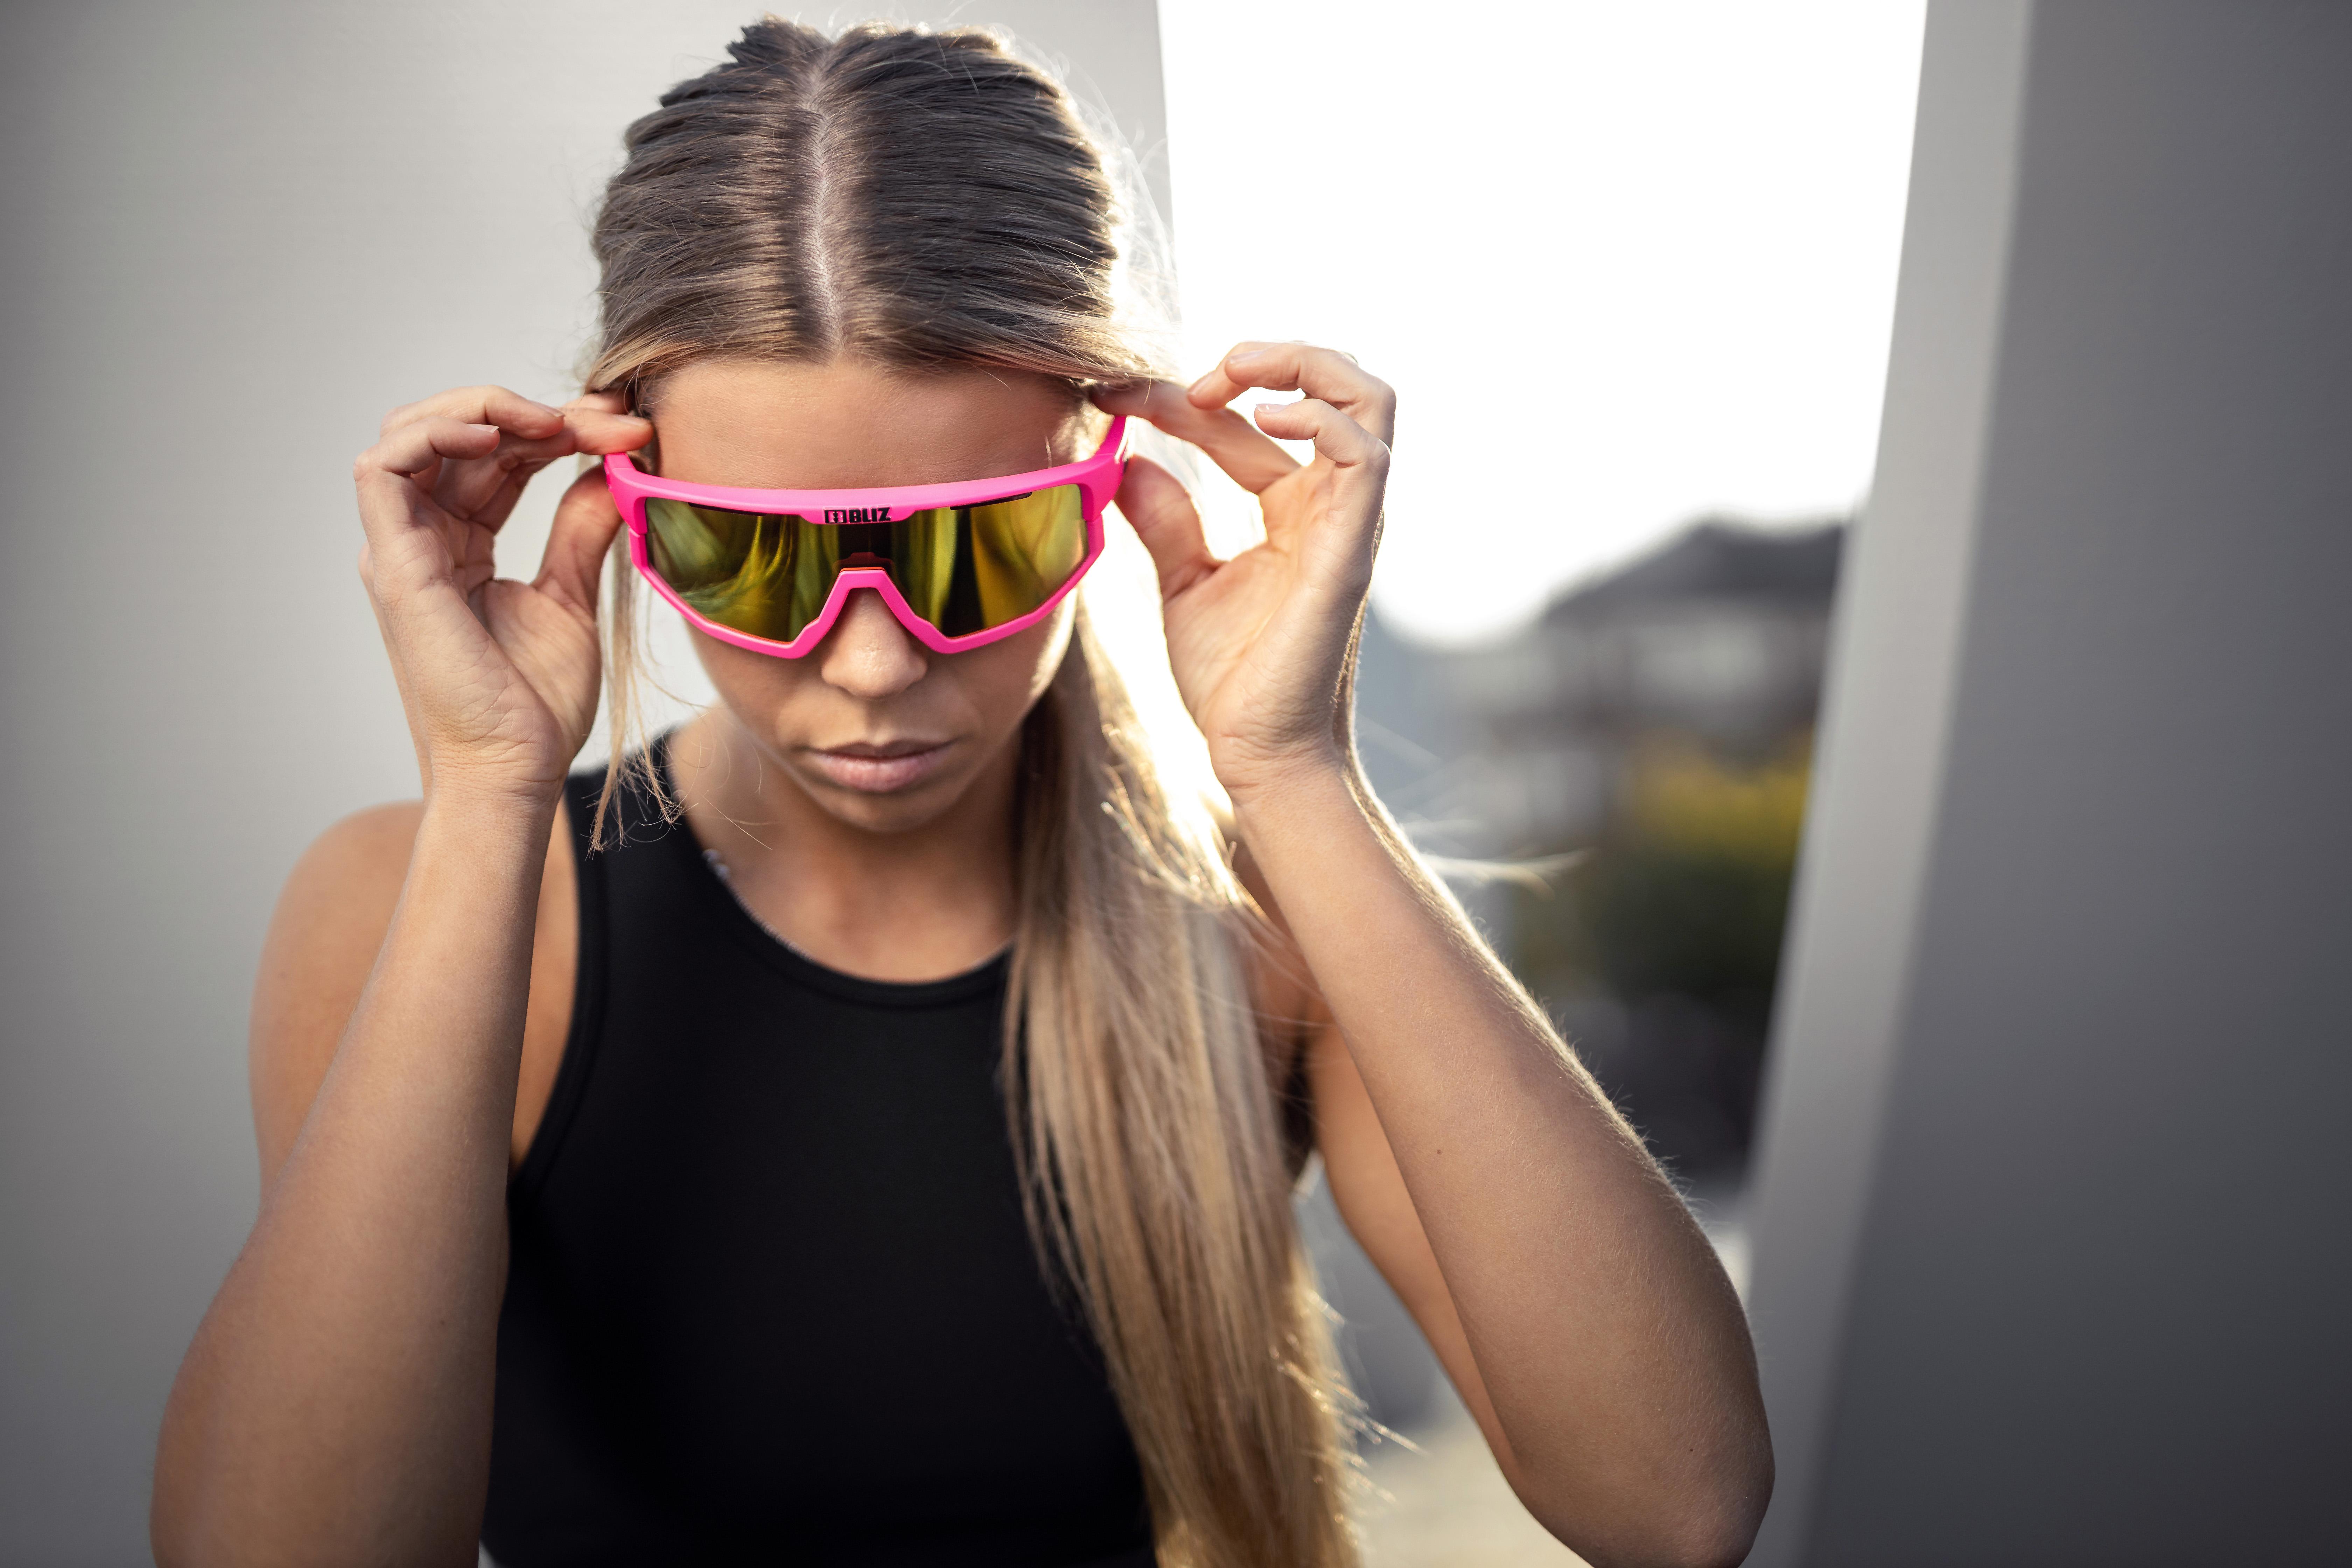 52001-43-vision-bliz-sunglasses-fitness-pink-sportsglasses-helena-pettersson-lifestyle1.jpg